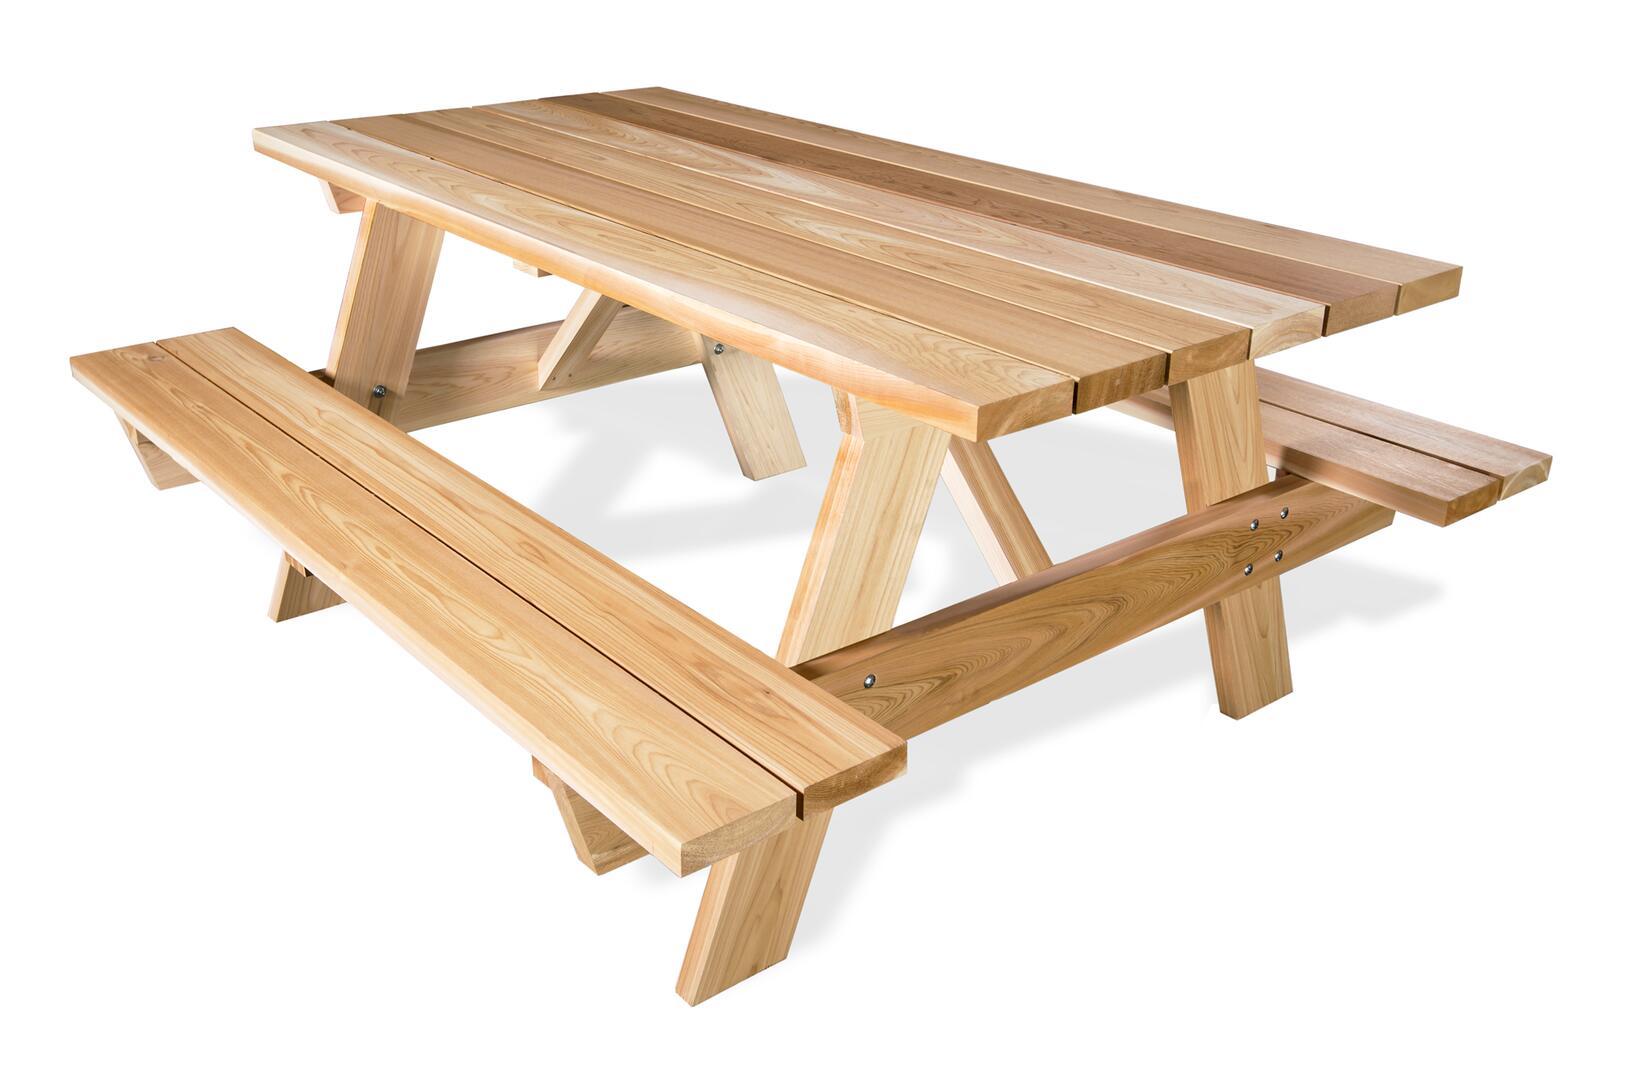 Stupendous All Things Cedar Pt70 Machost Co Dining Chair Design Ideas Machostcouk